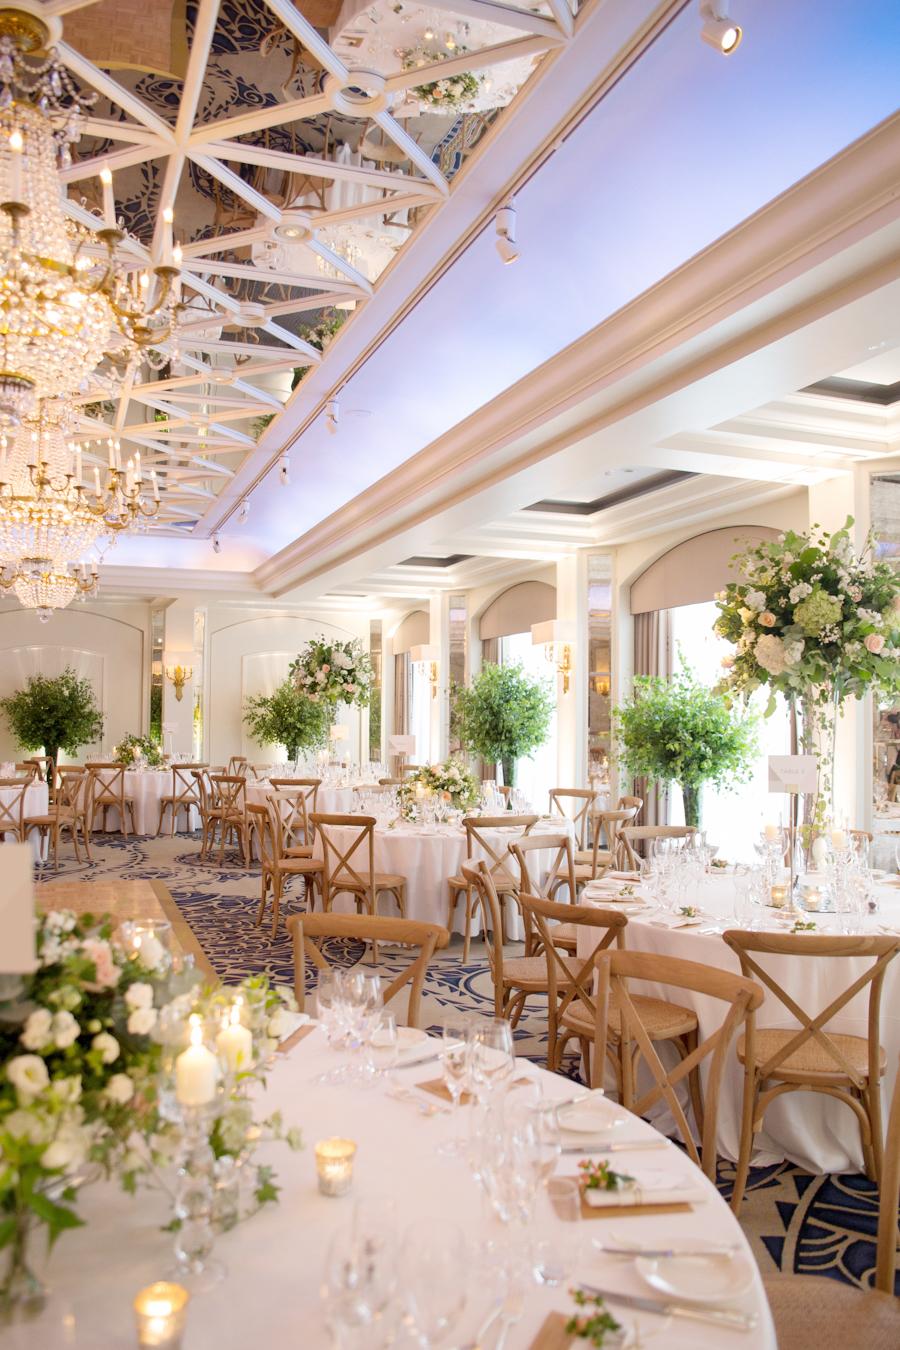 Copy of Copy of The Berkeley Wedding | Luxury Wedding Planner | Lamare London